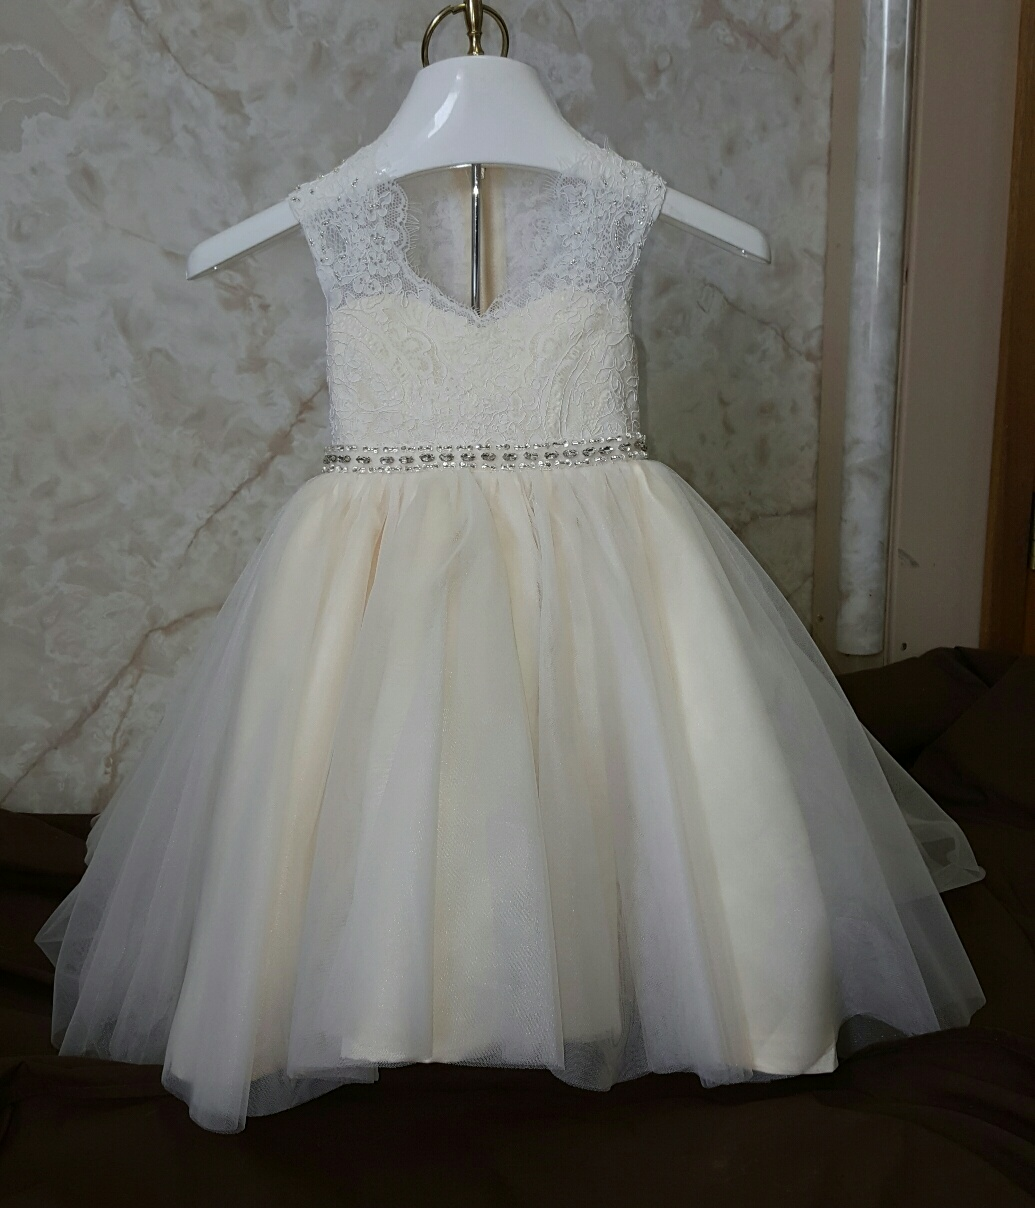 Baby girls wedding dress. Size 12 month baby wedding dress.